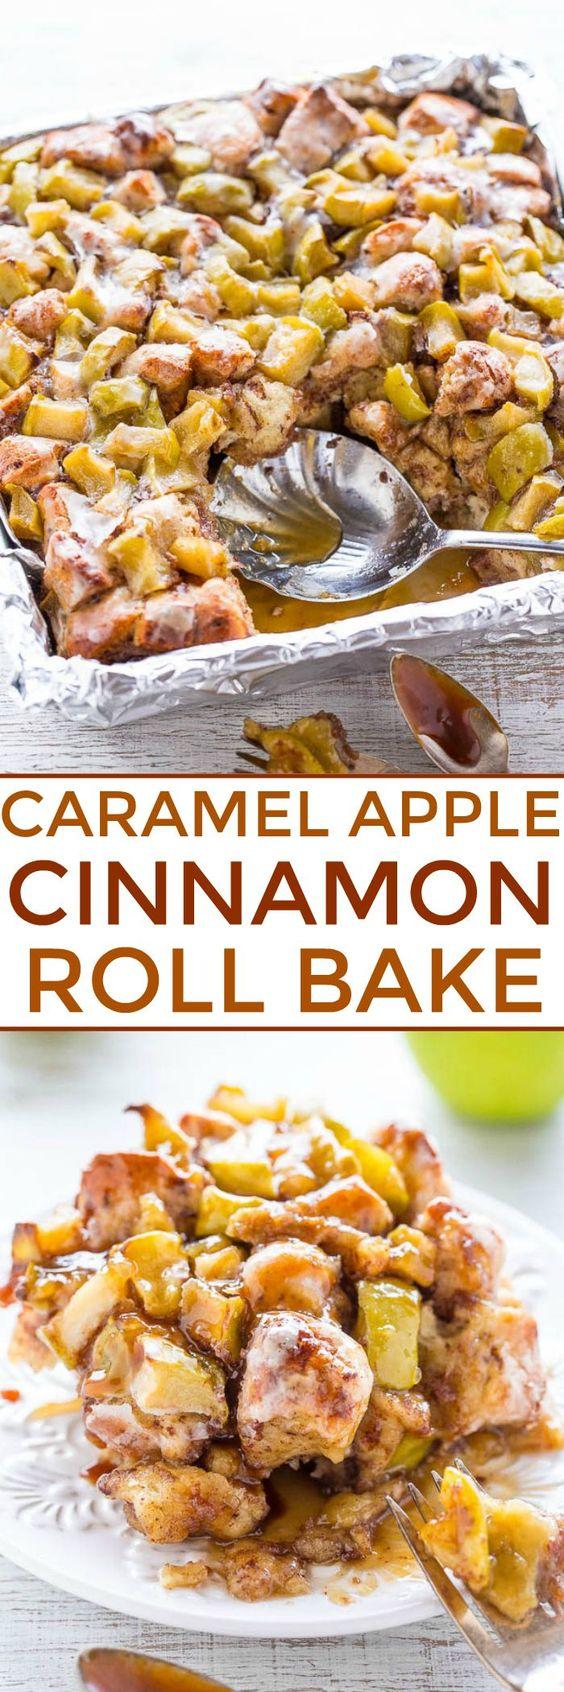 Caramel, Apple, And Cinnamon Breakfast Casserole Recipe — Dishmaps